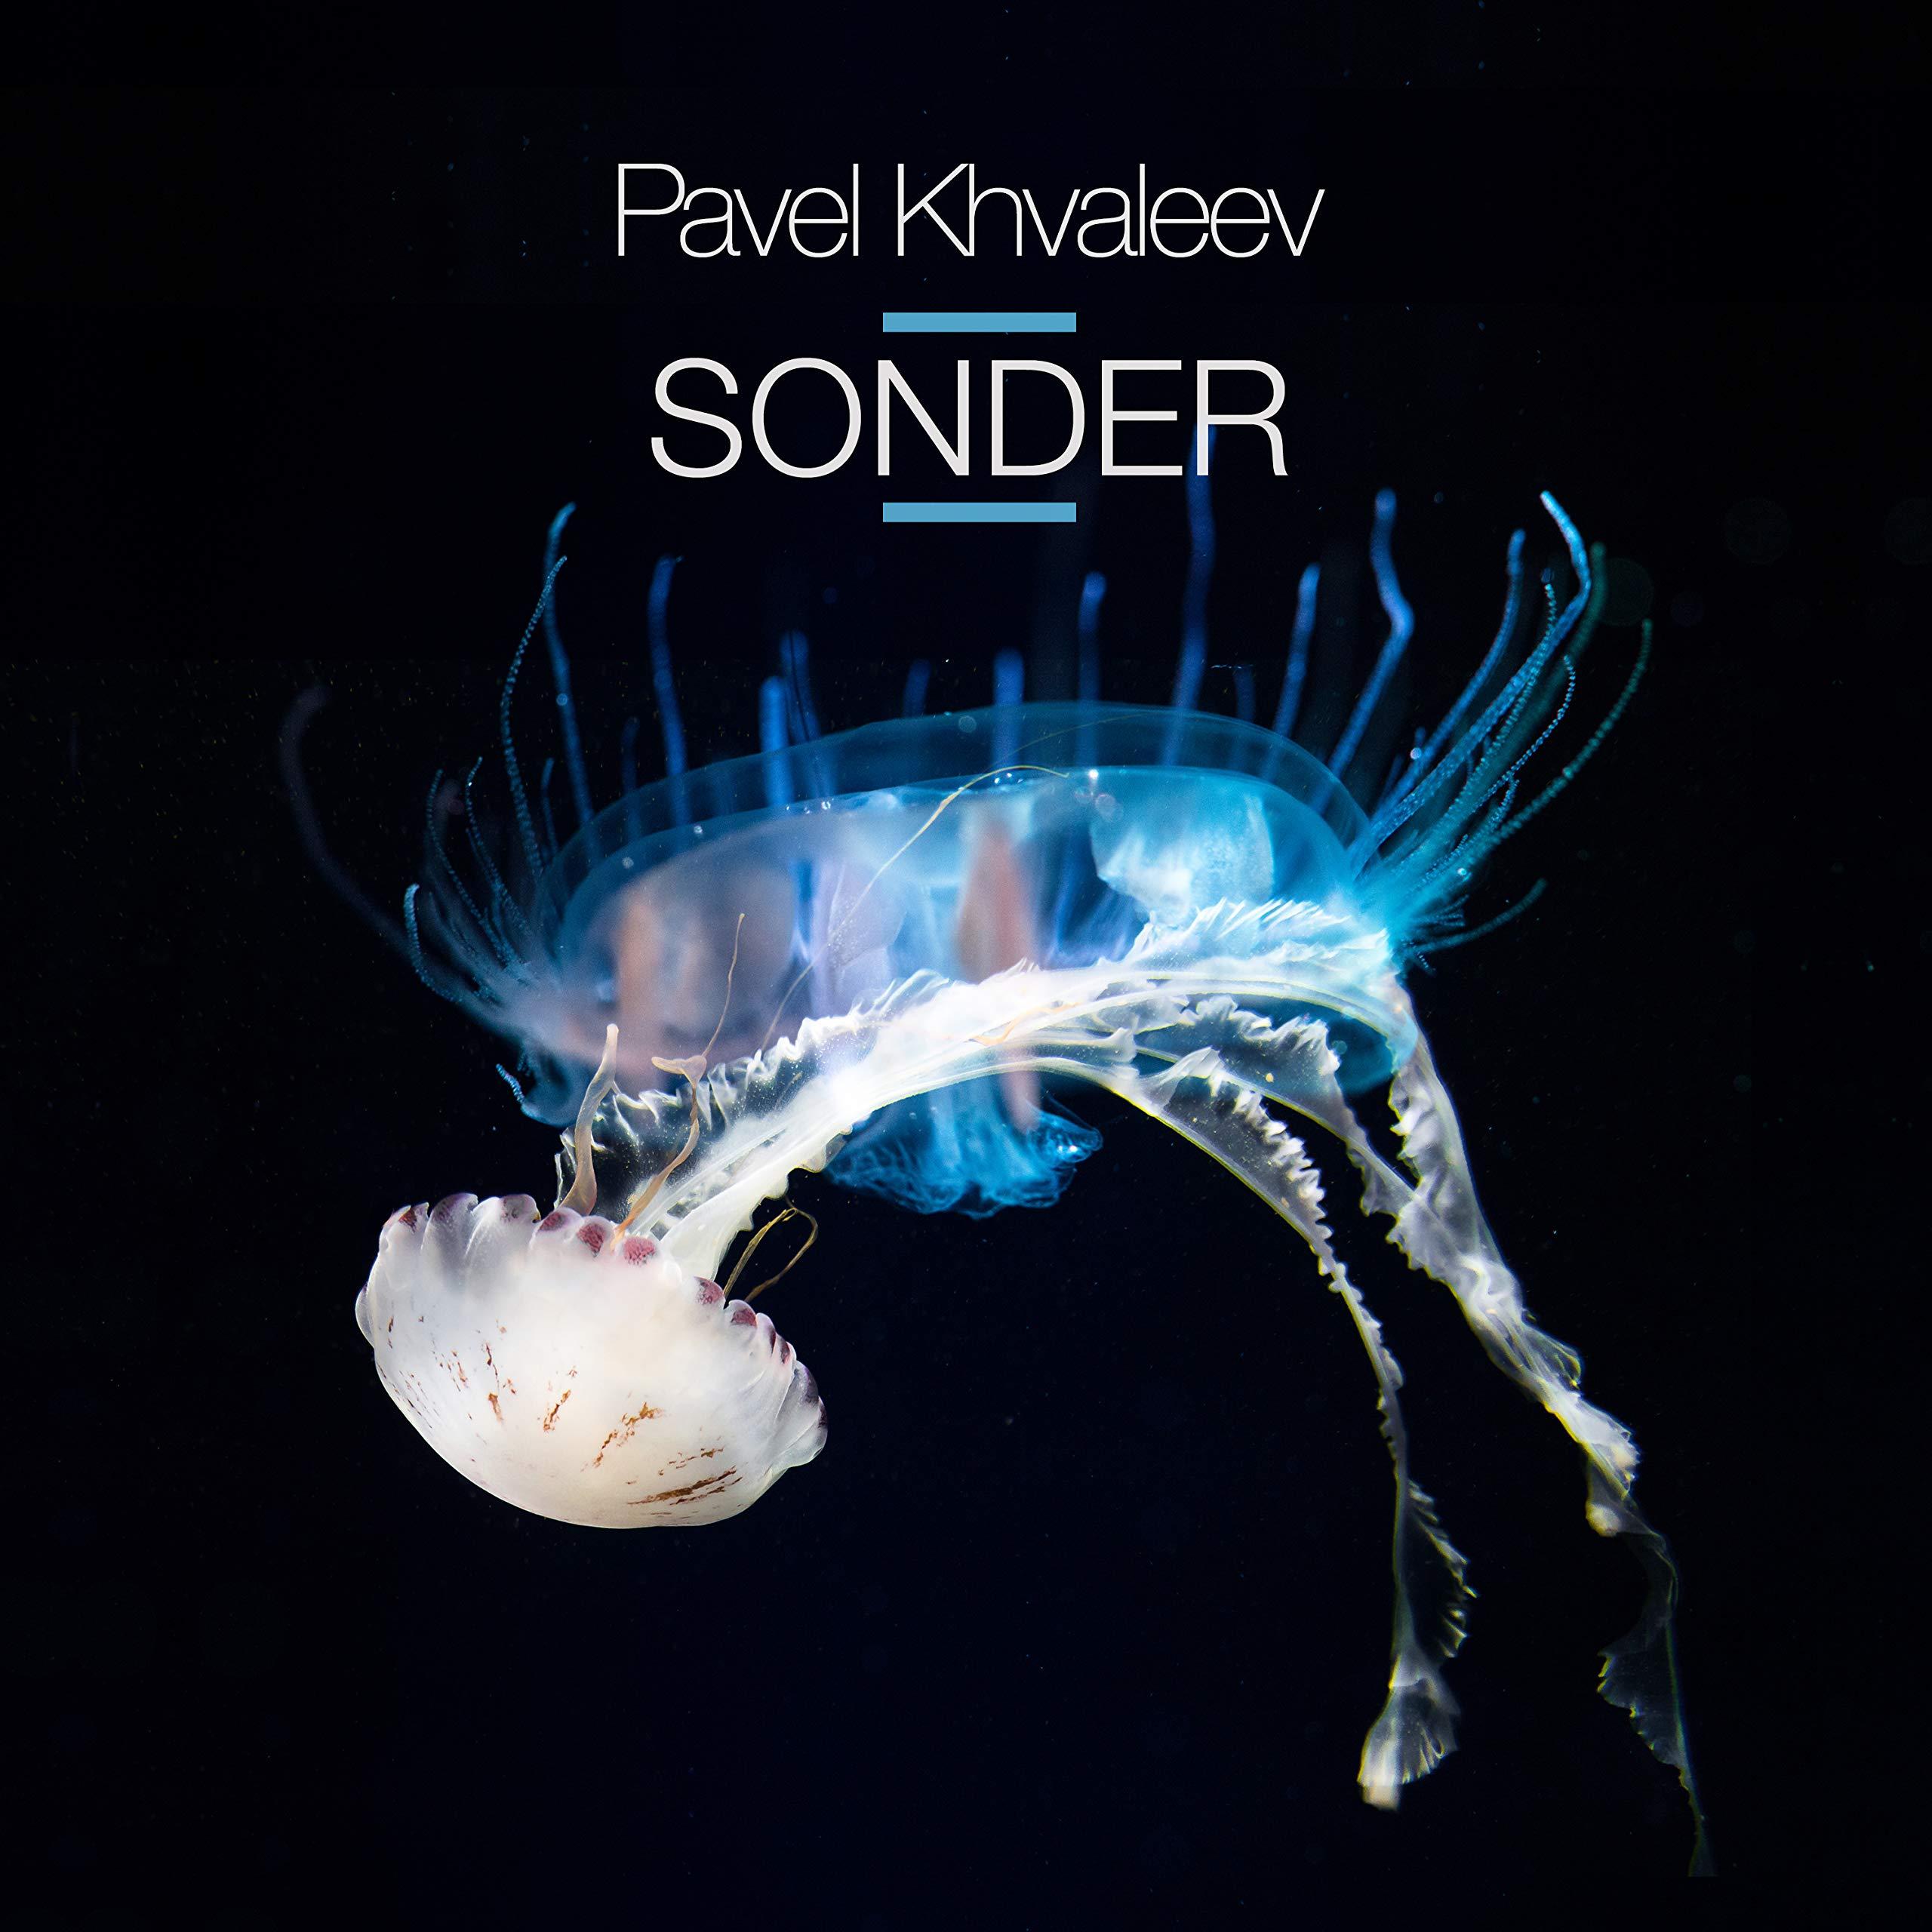 Pavel Khvaleev – Sonder (2018) [FLAC]